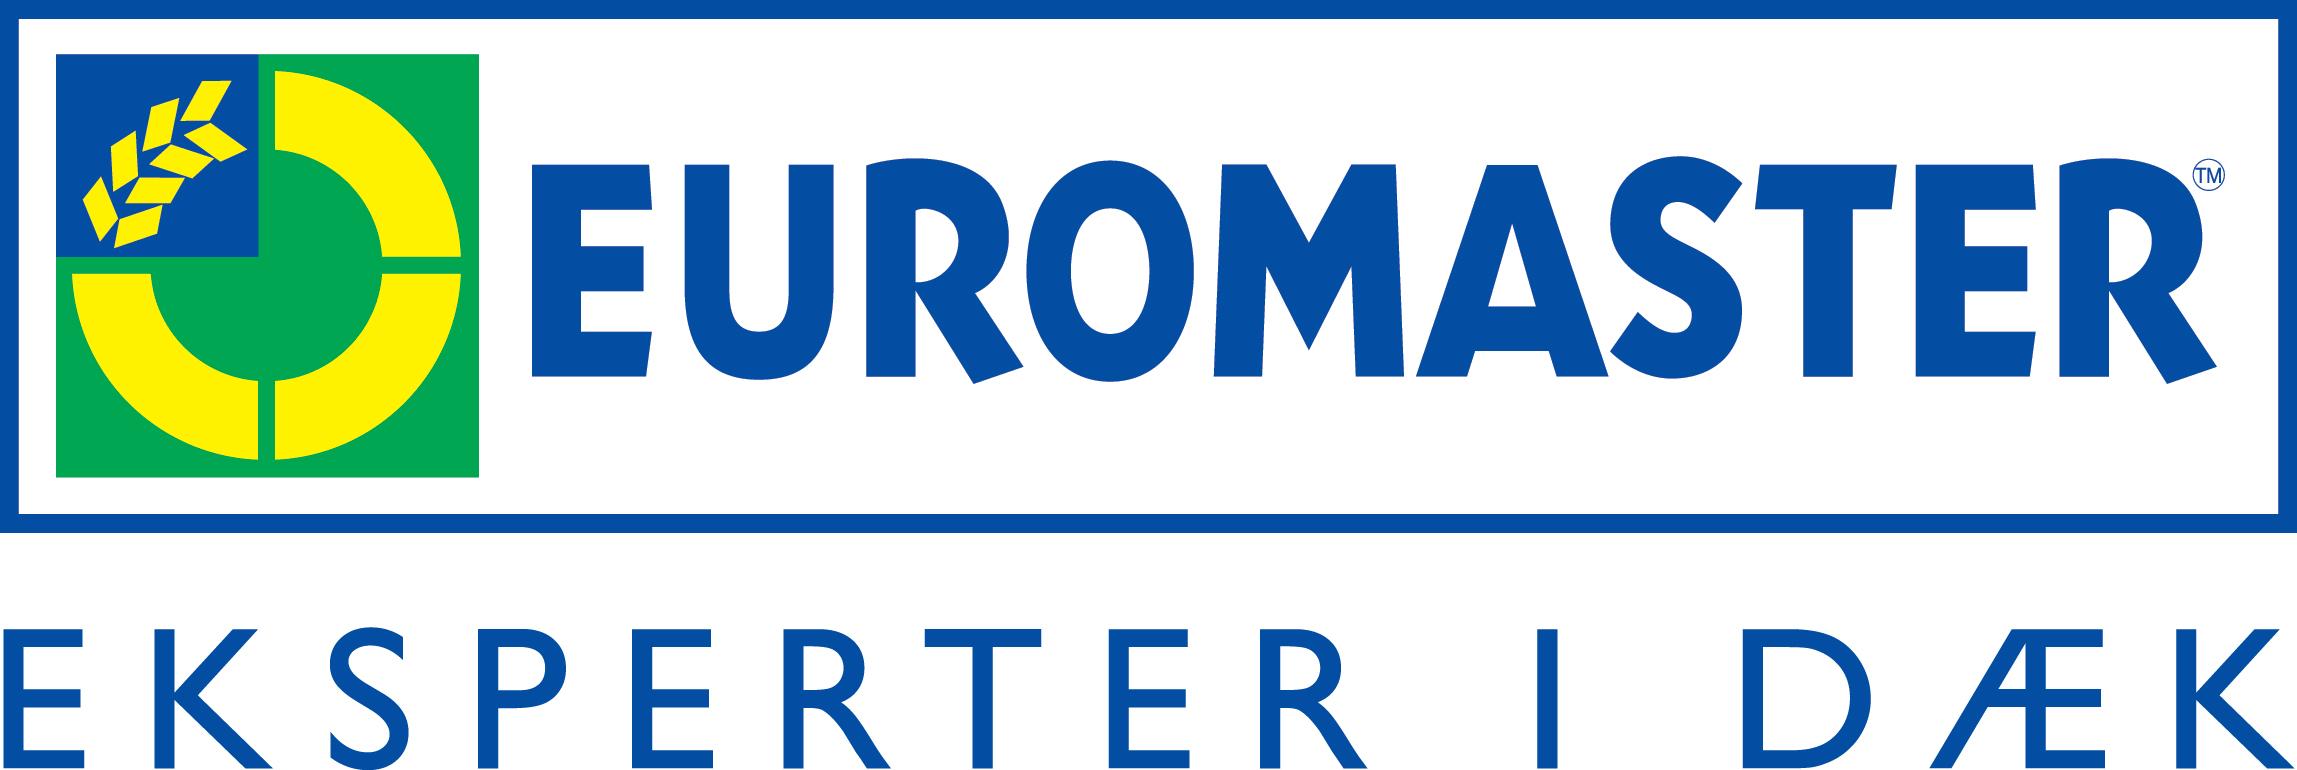 Euromaster Brøndby logo